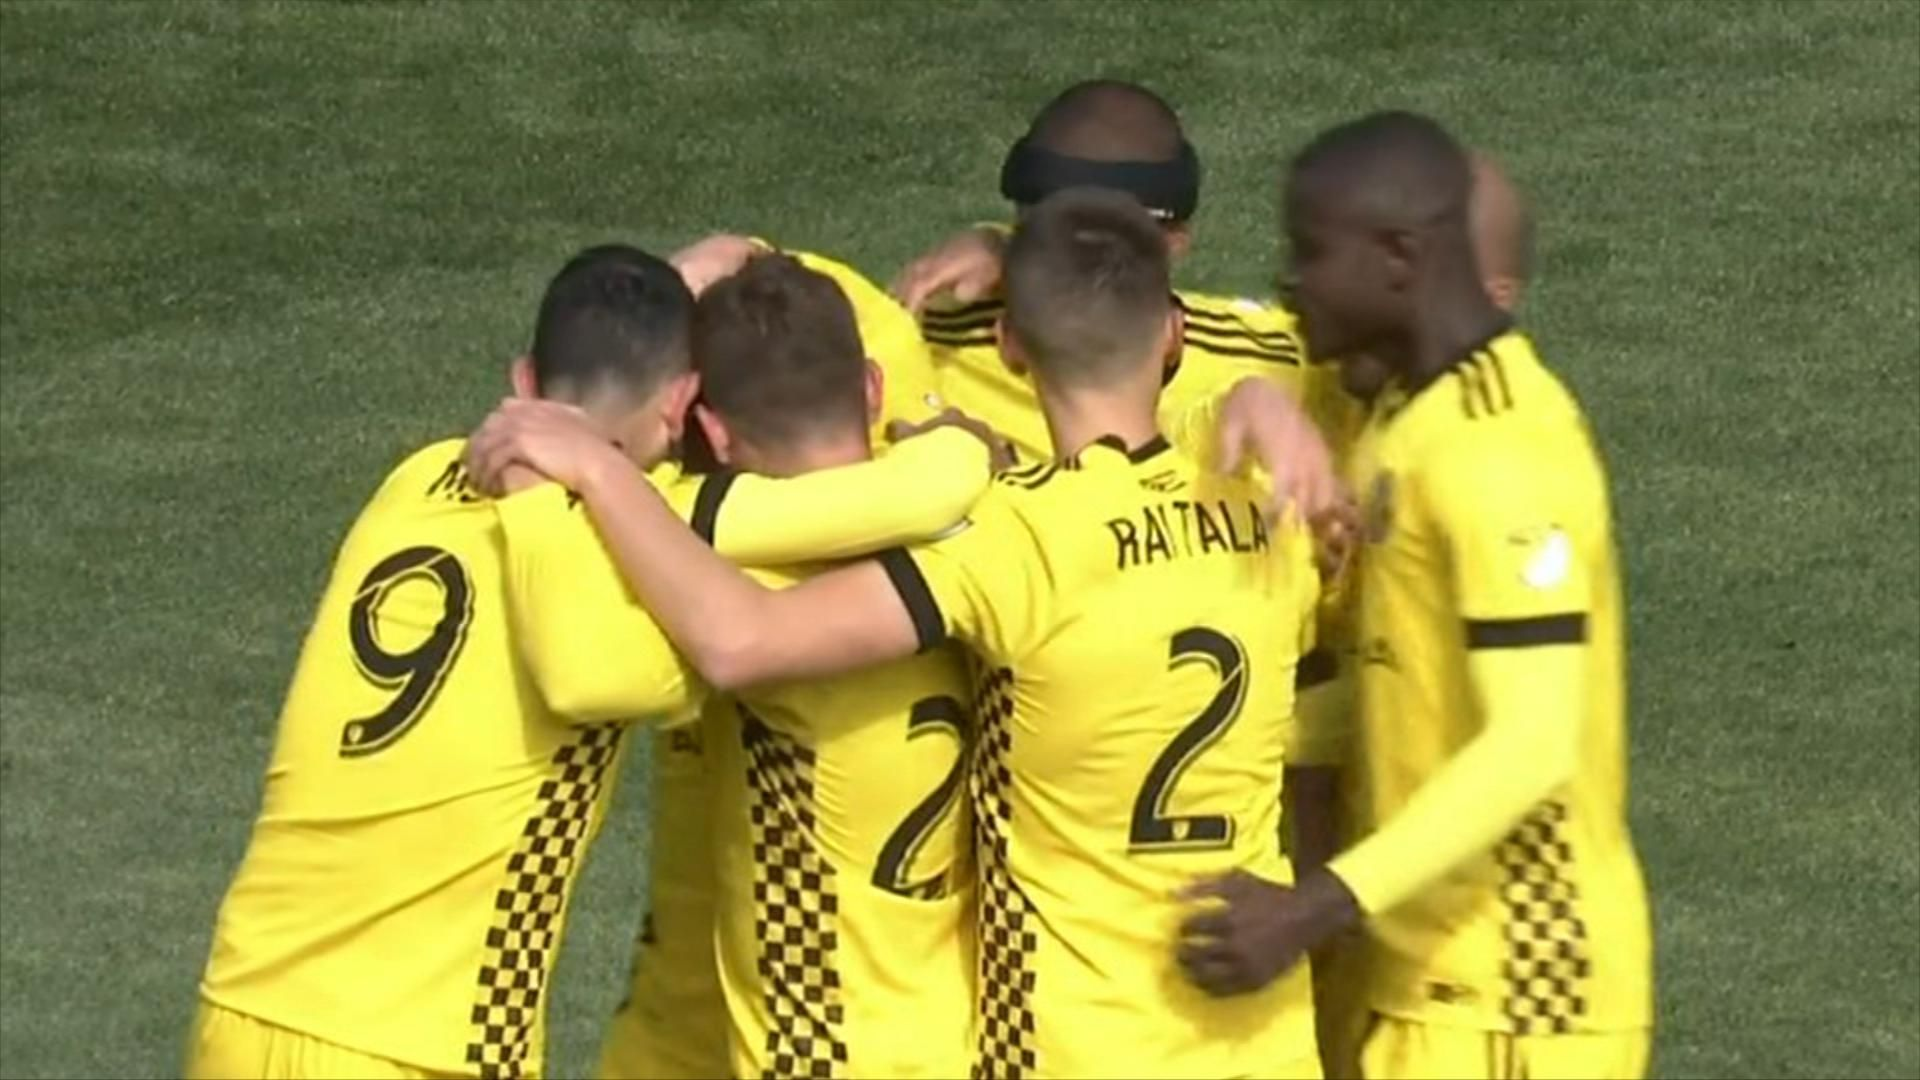 Video via MLS: Crew SC 1-1 Chicago Fire